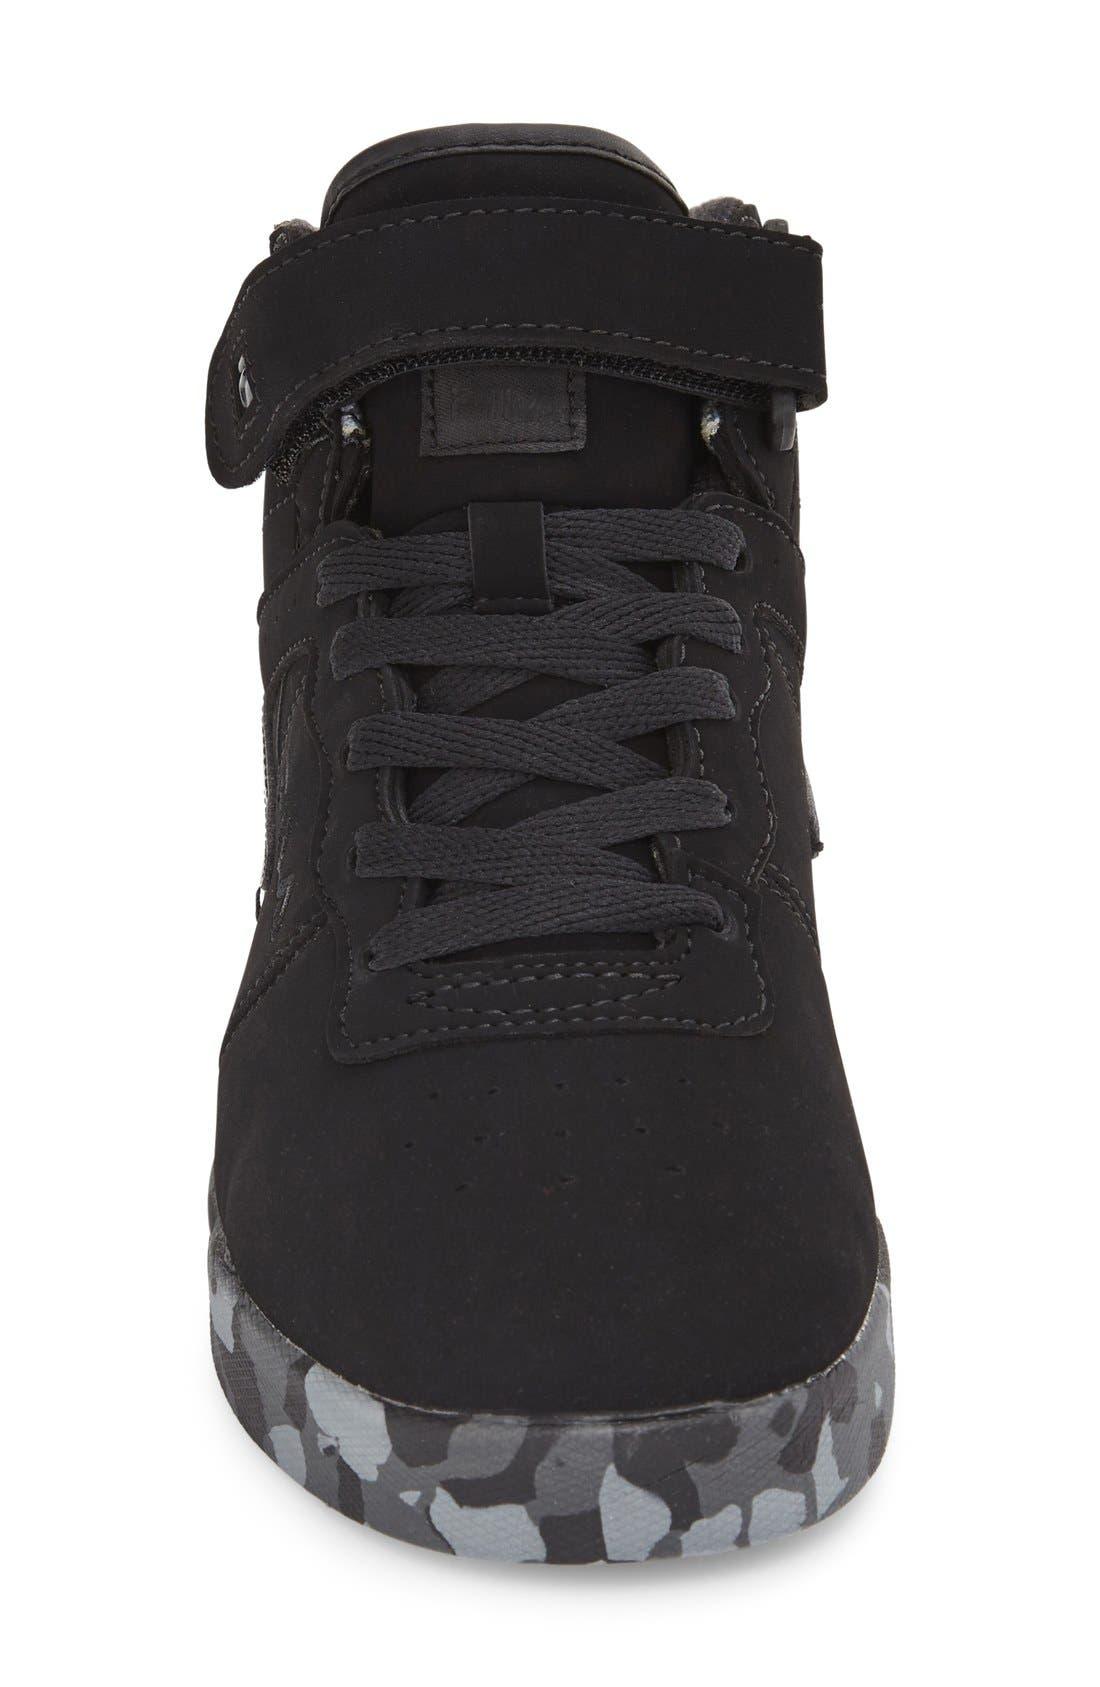 Vulc 13 Mashup High Top Sneaker,                             Alternate thumbnail 8, color,